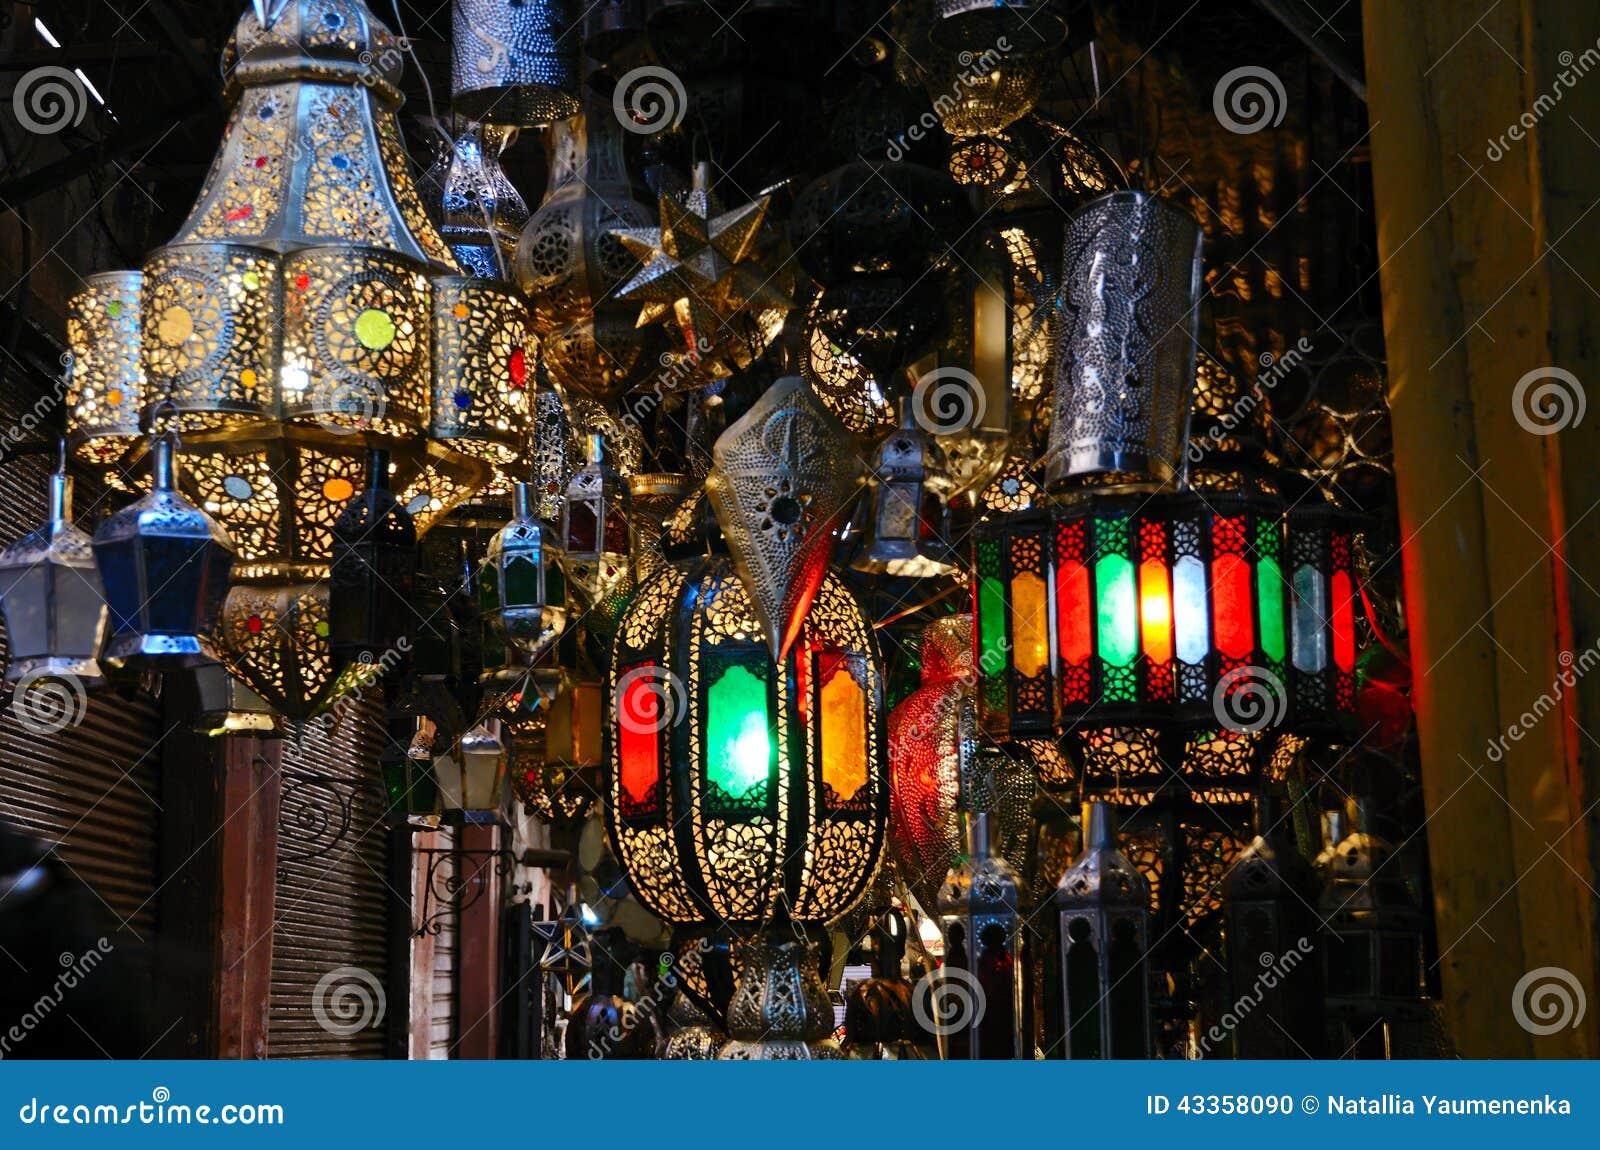 Traditionelle Marokkanische Lampen Stockfoto - Bild: 43358090